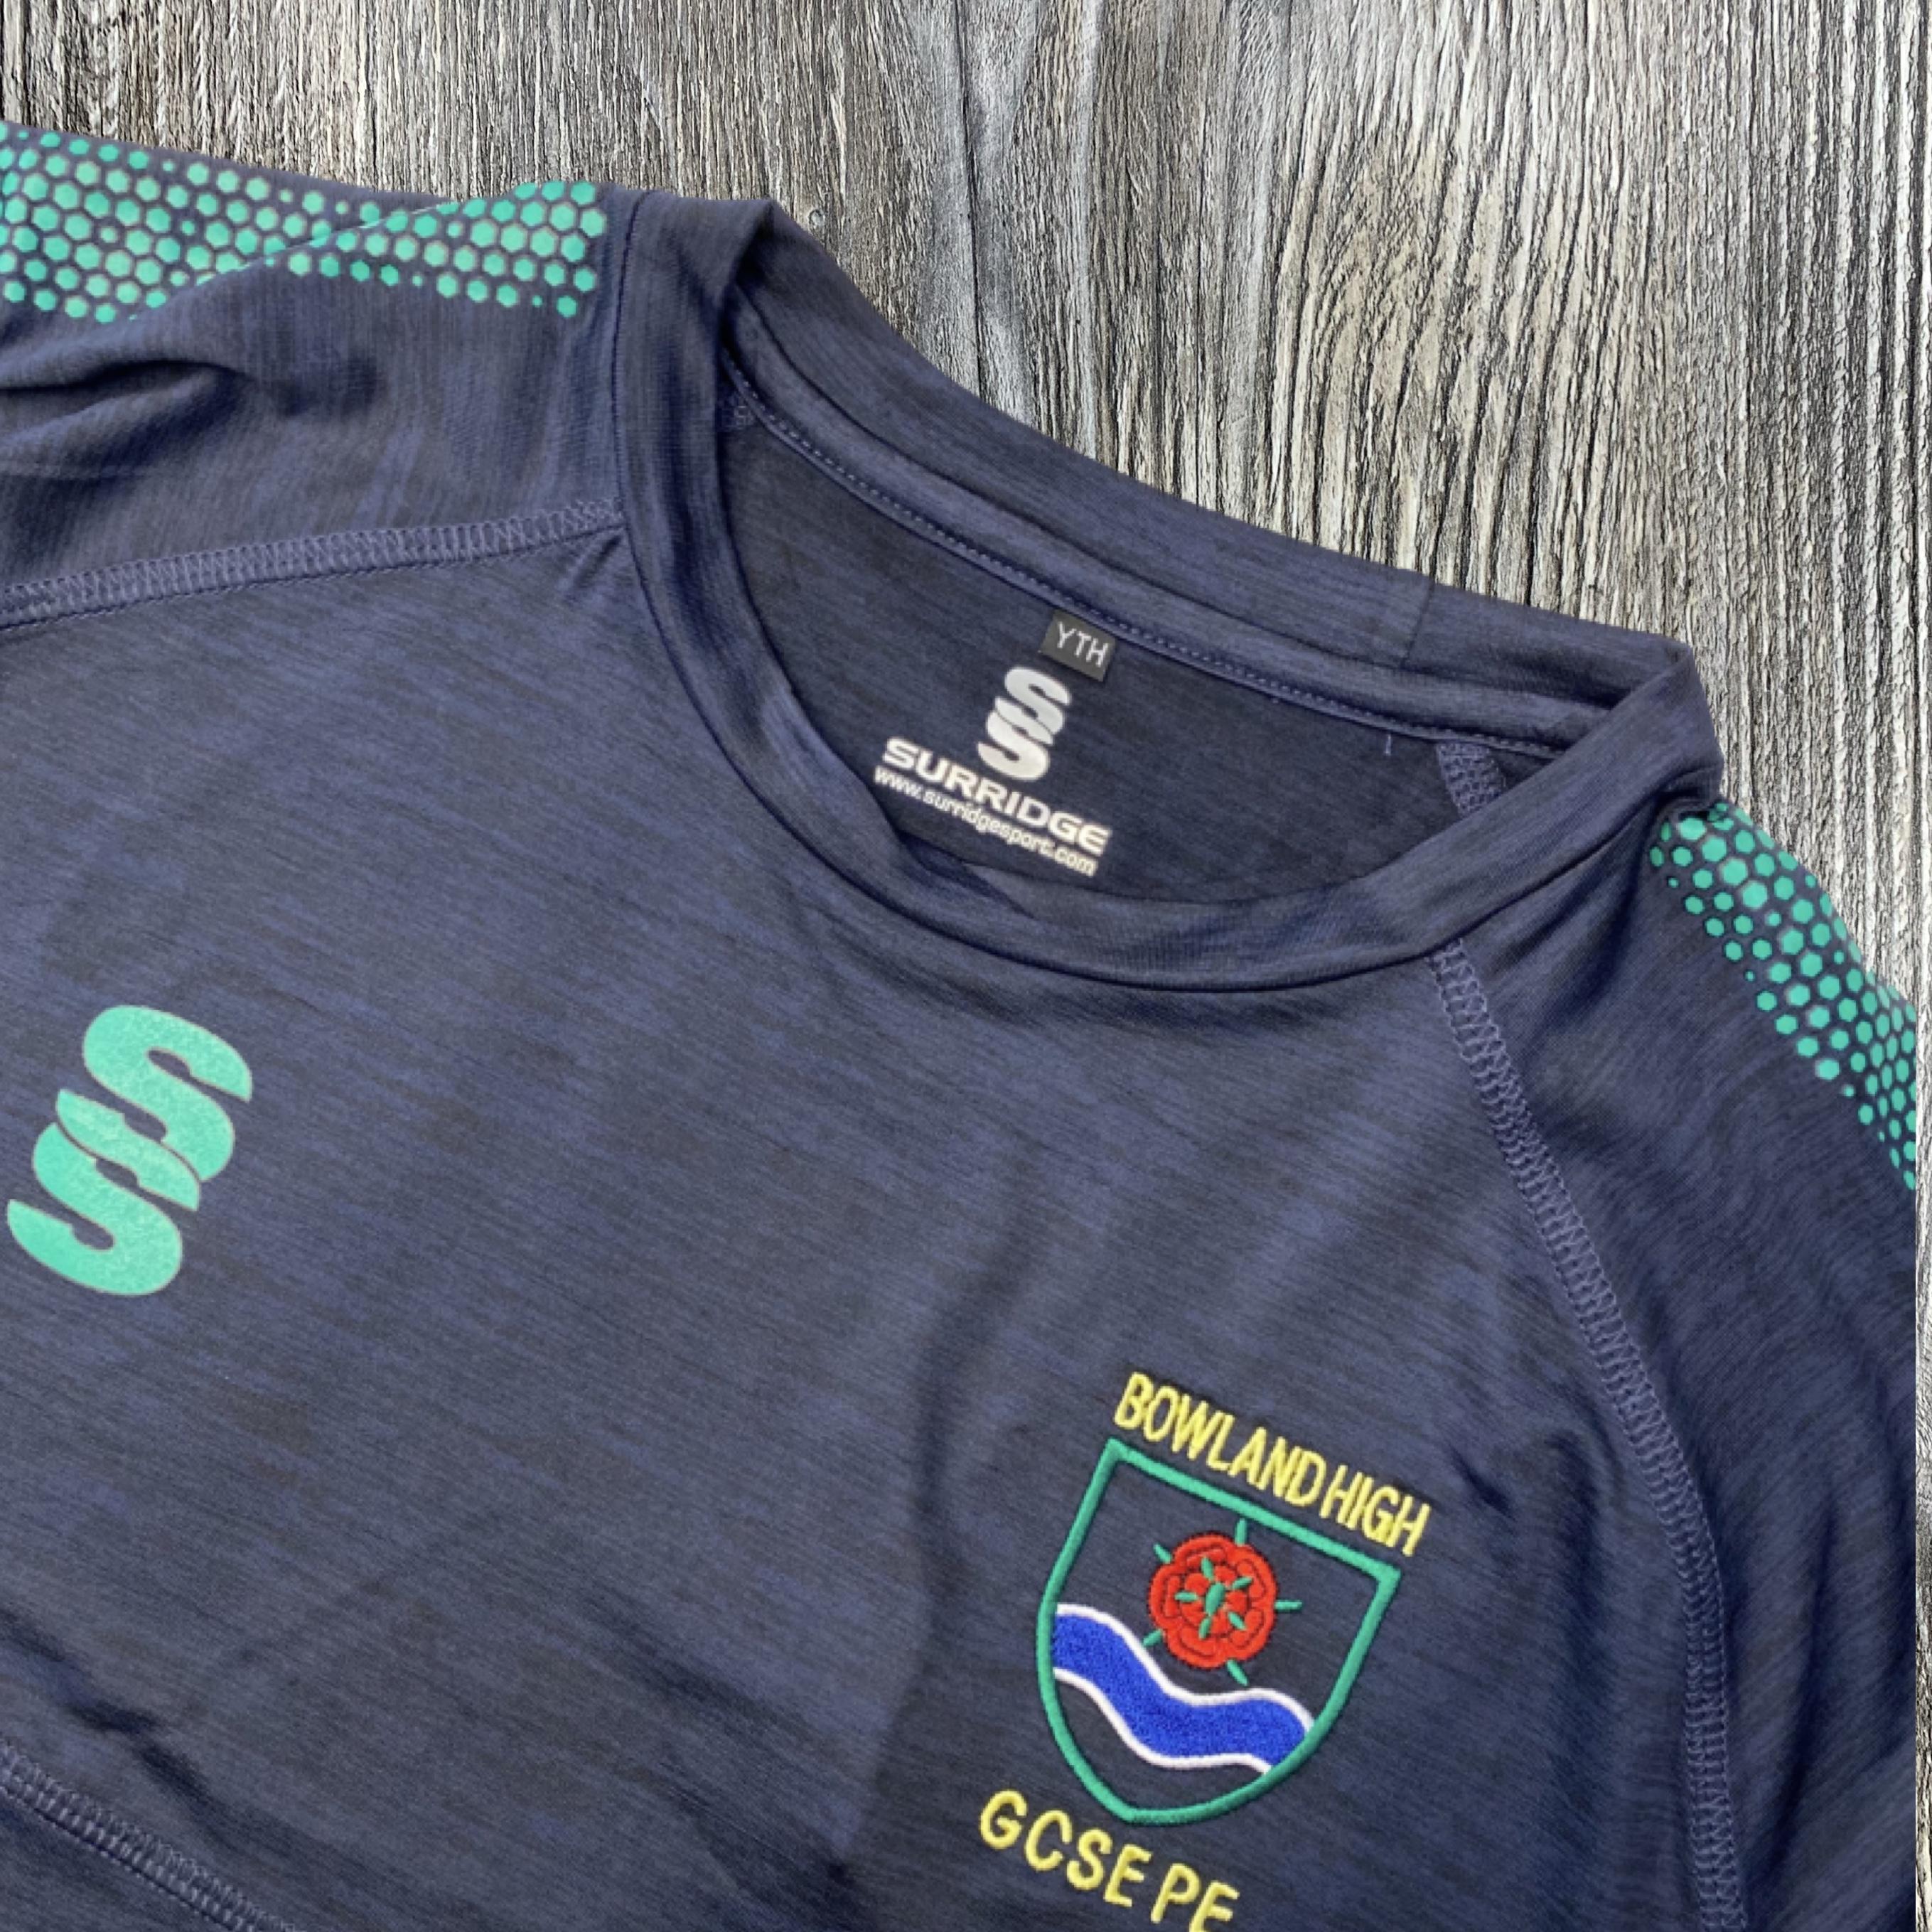 Bowland GCSE PE T-Shirt